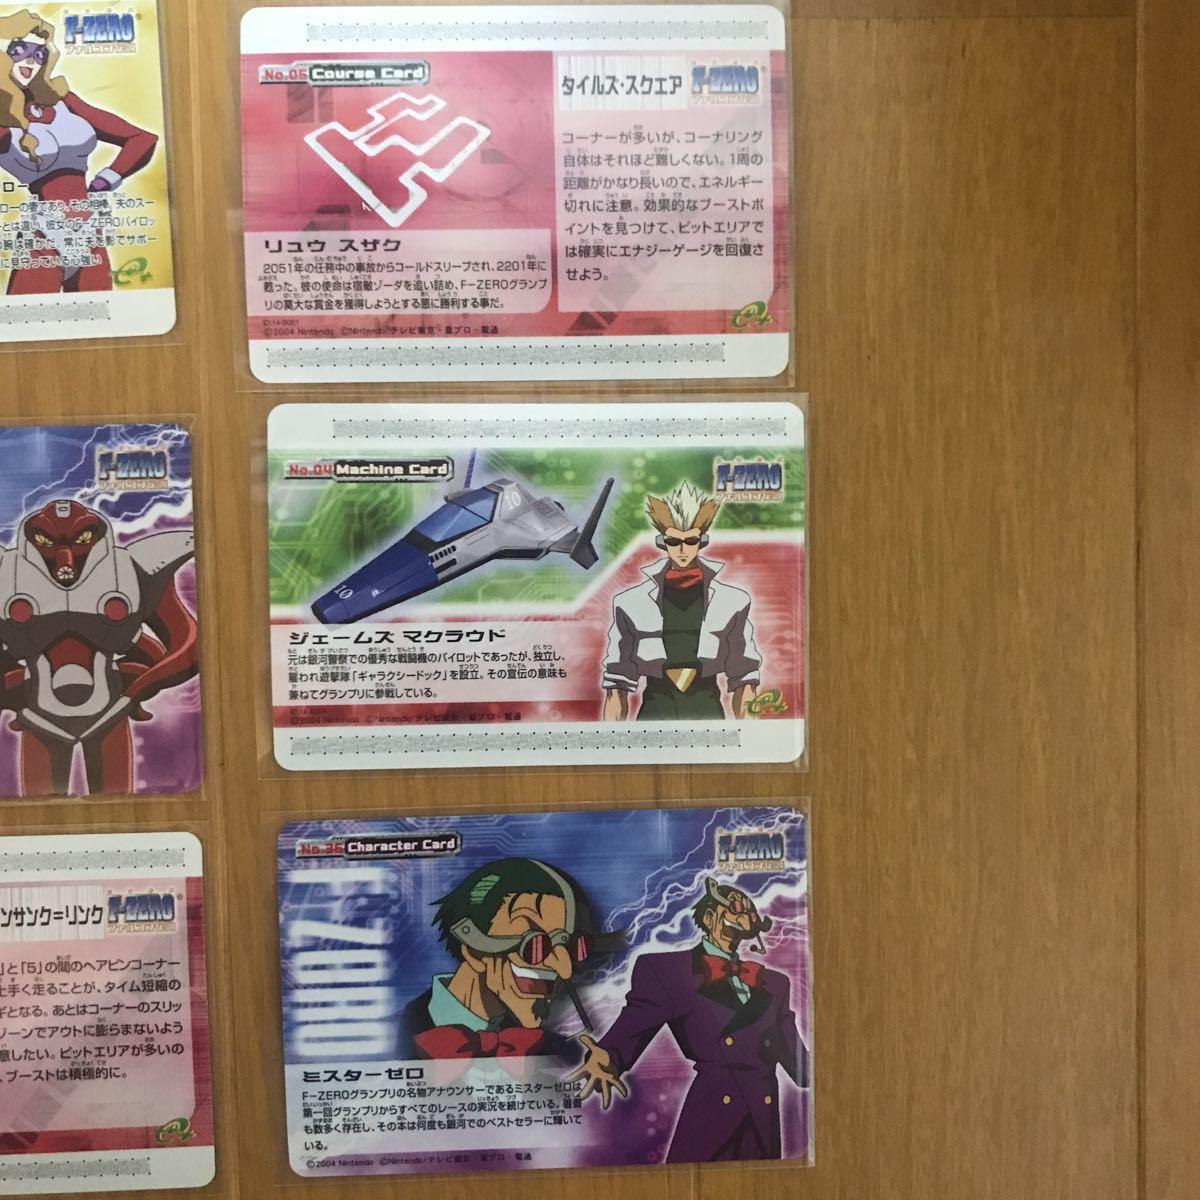 GBA  F-ZERO ファルコン伝説 &【希少】7枚 カードダス版 2枚有り☆ファルコン伝説カードe+ トレカ カード 任天堂 キャプテンファルコン_画像9